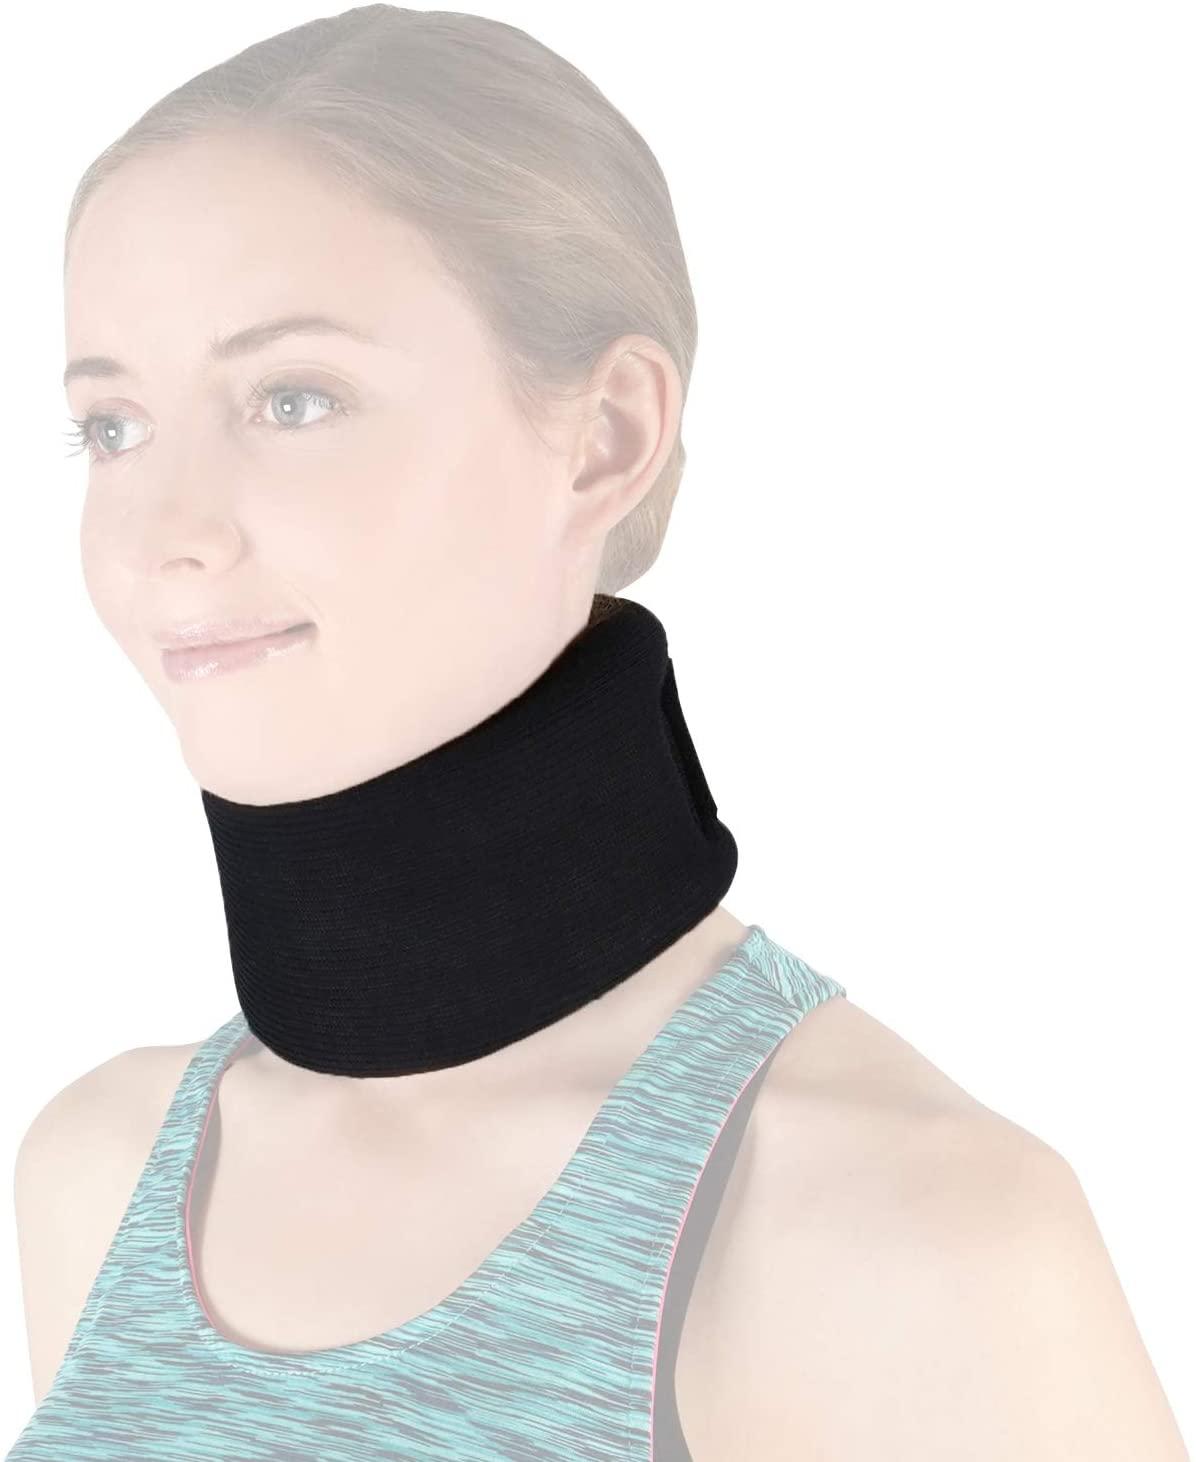 Soles Cervical Collar and Neck Brace (SLS601L)